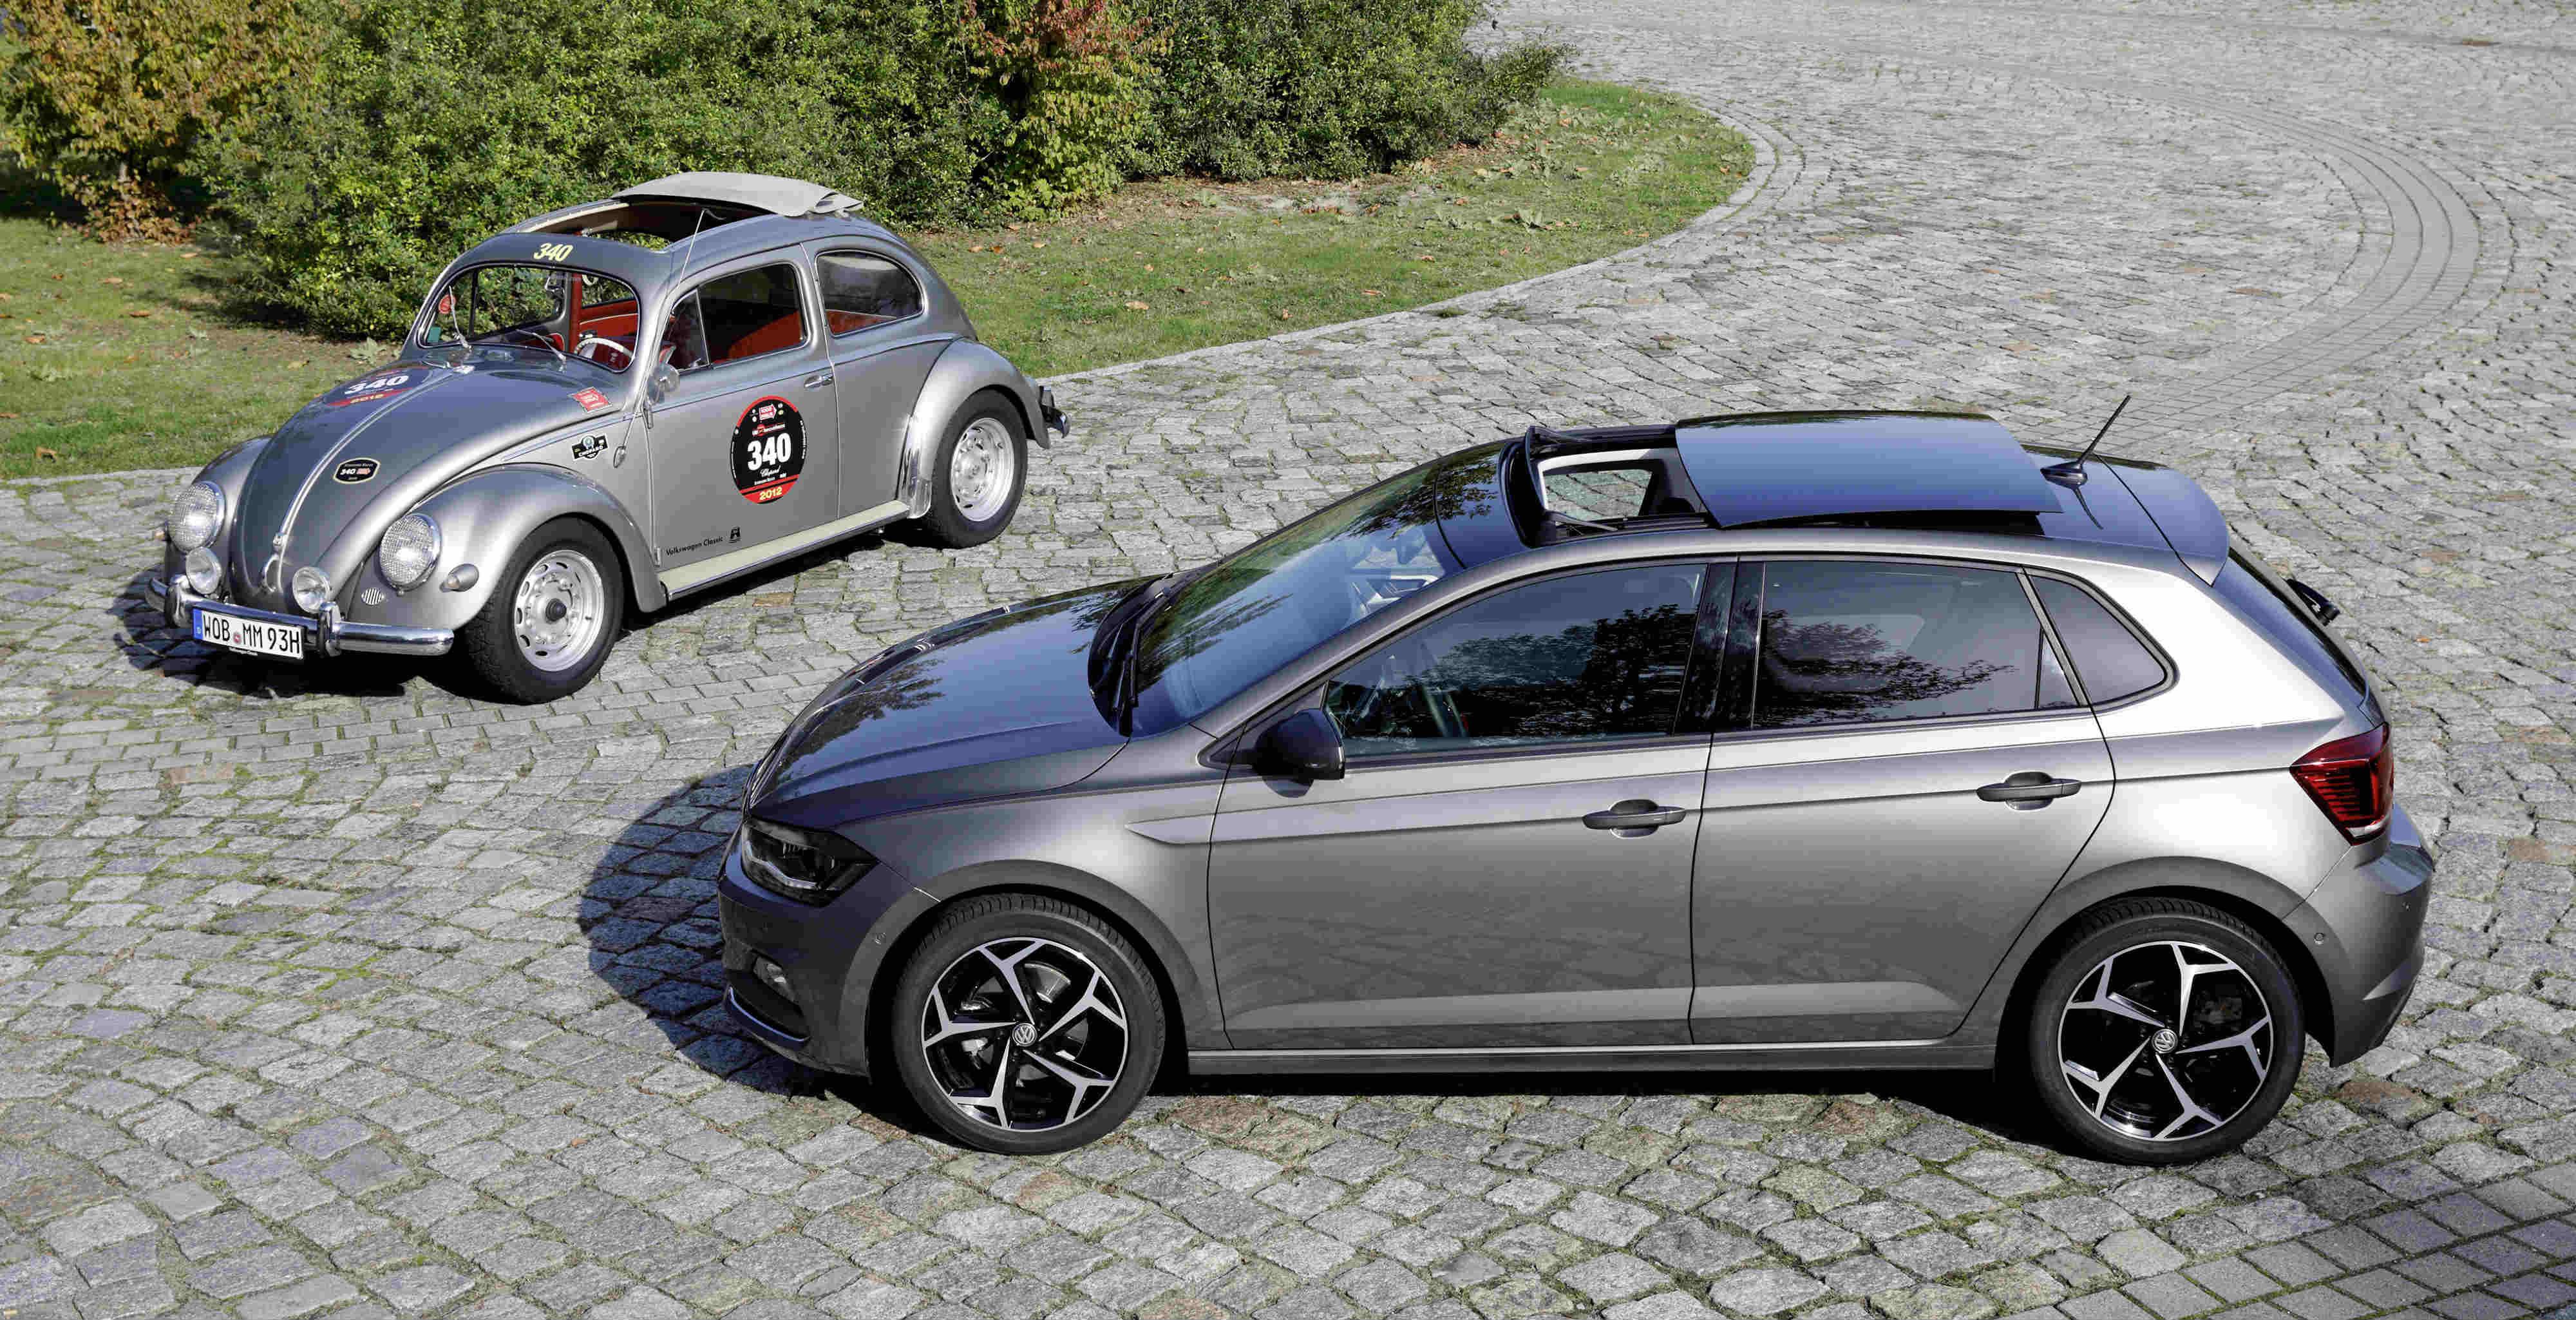 volkswagens panoramic sunroof reinterprets  legendary vw beetles folding soft top torque